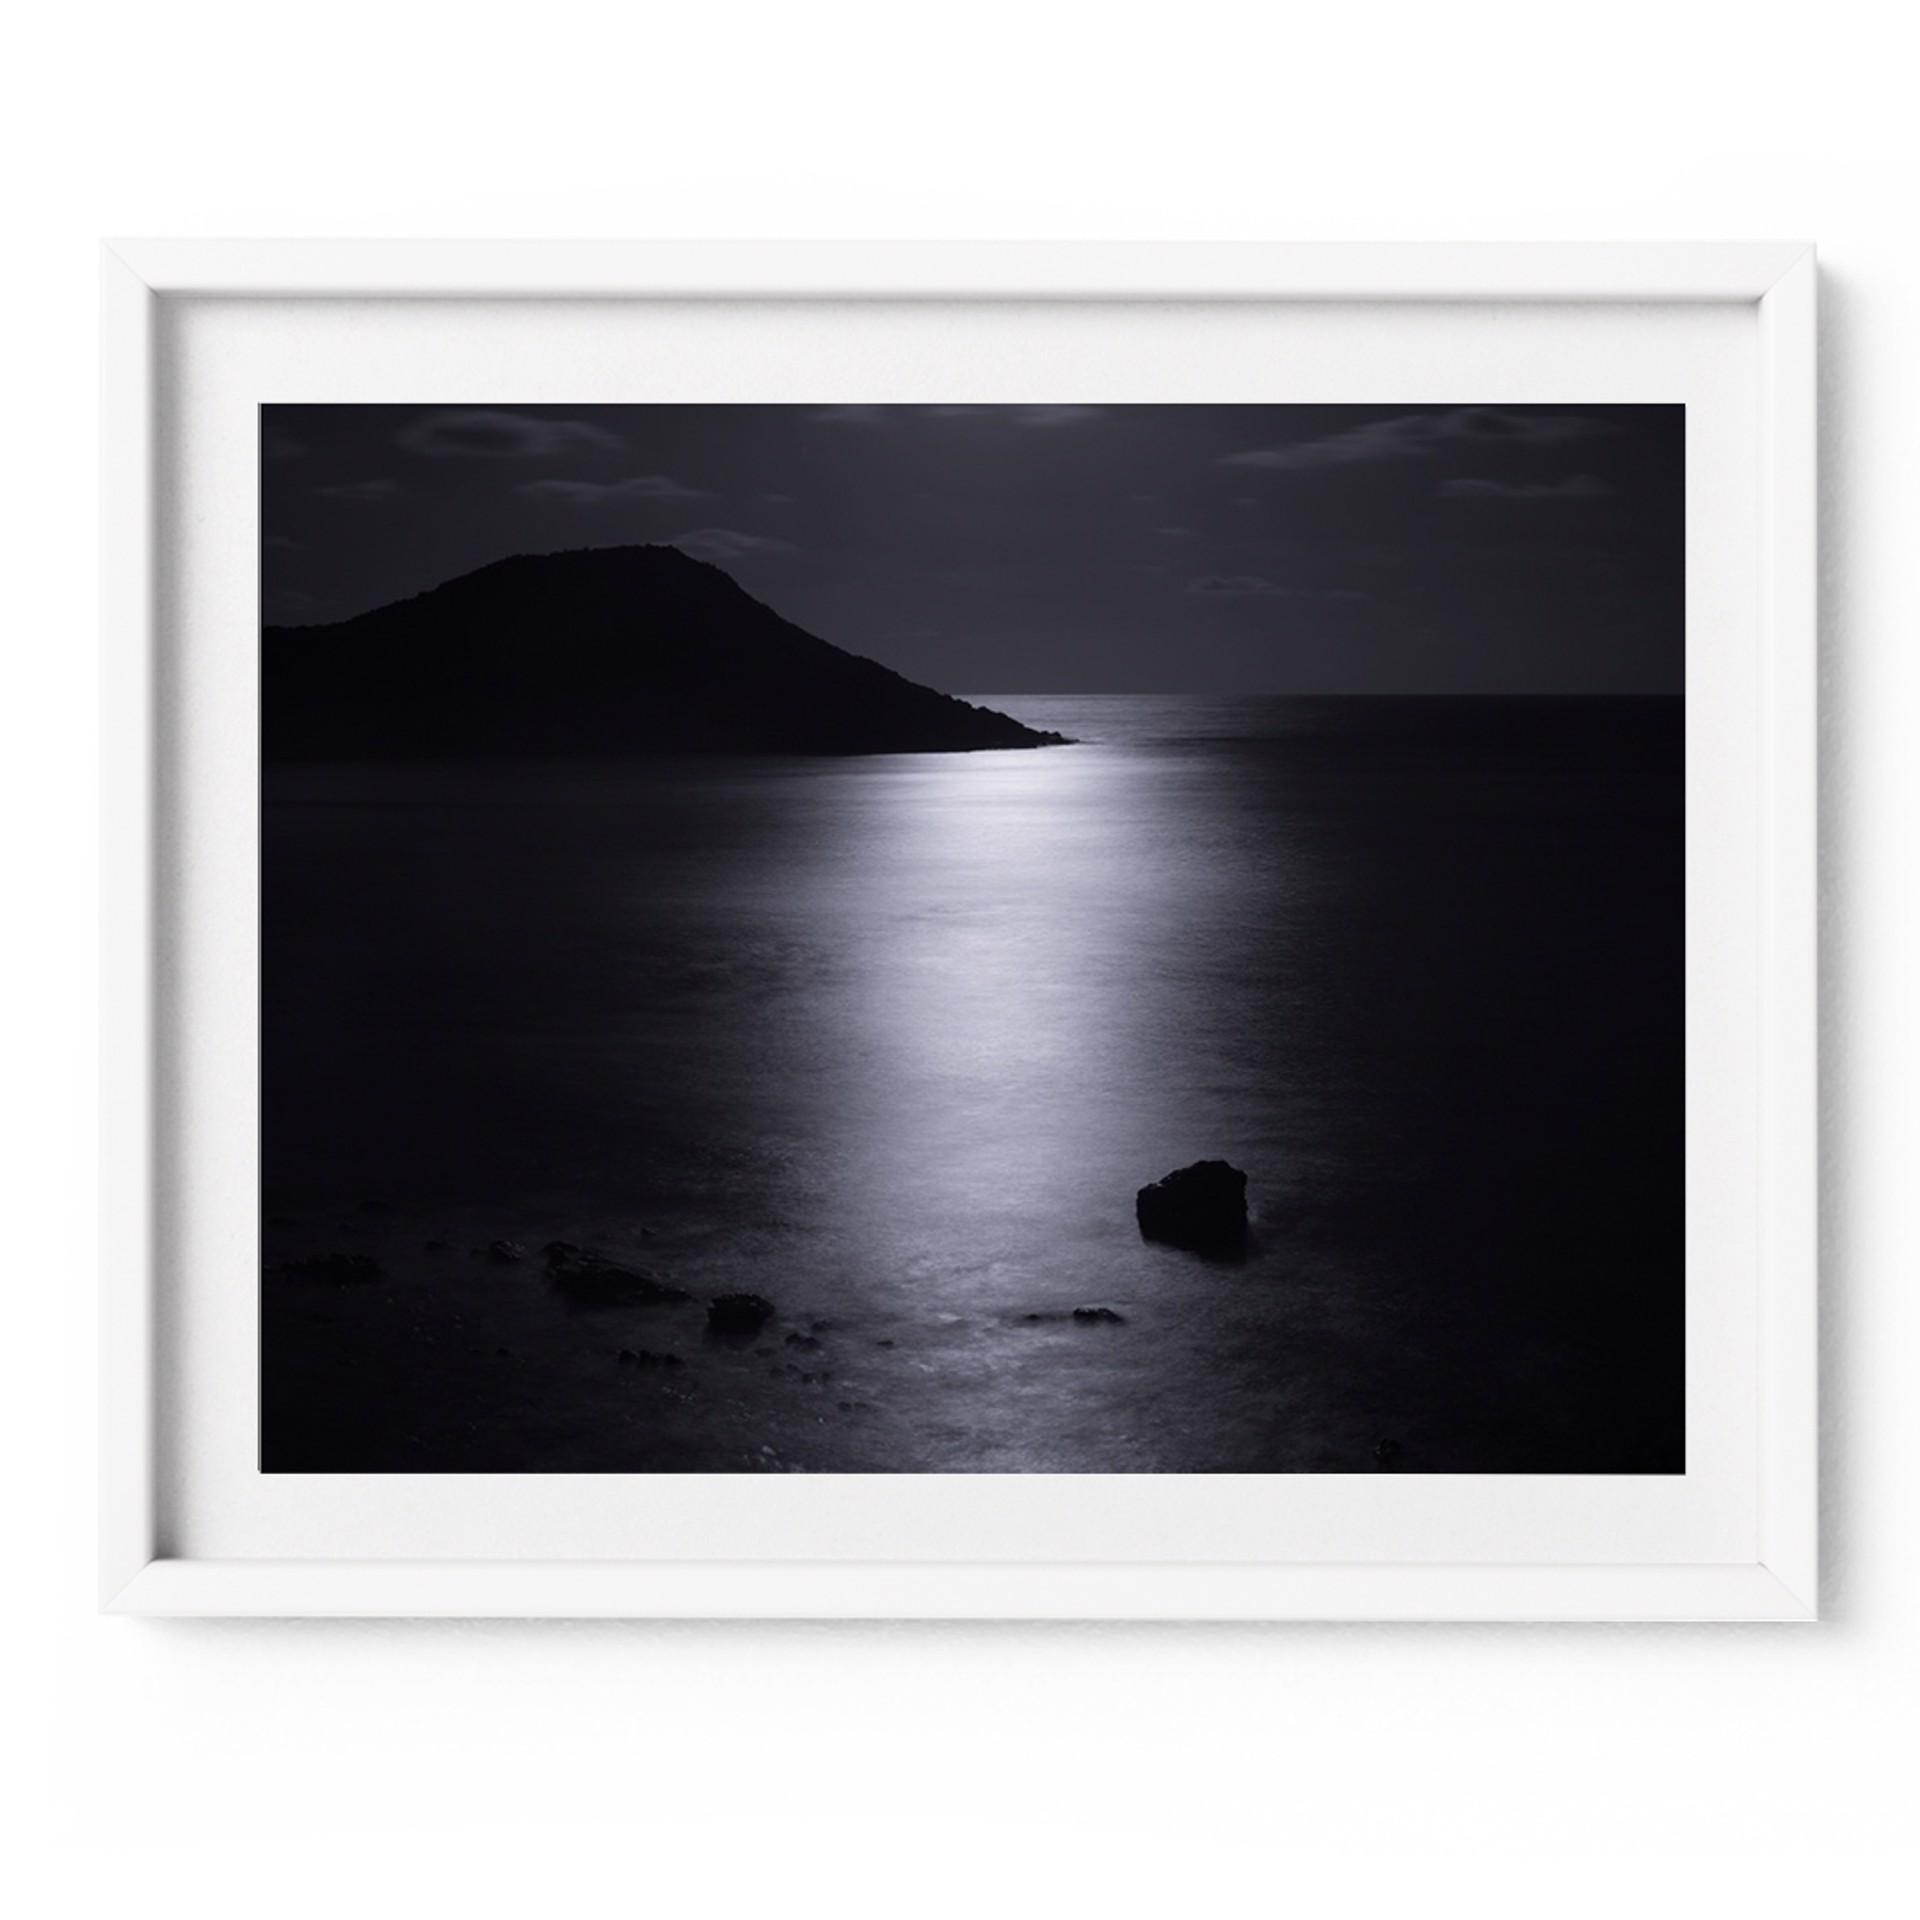 Moonscape #2 by Gabriella Imperatori-Penn